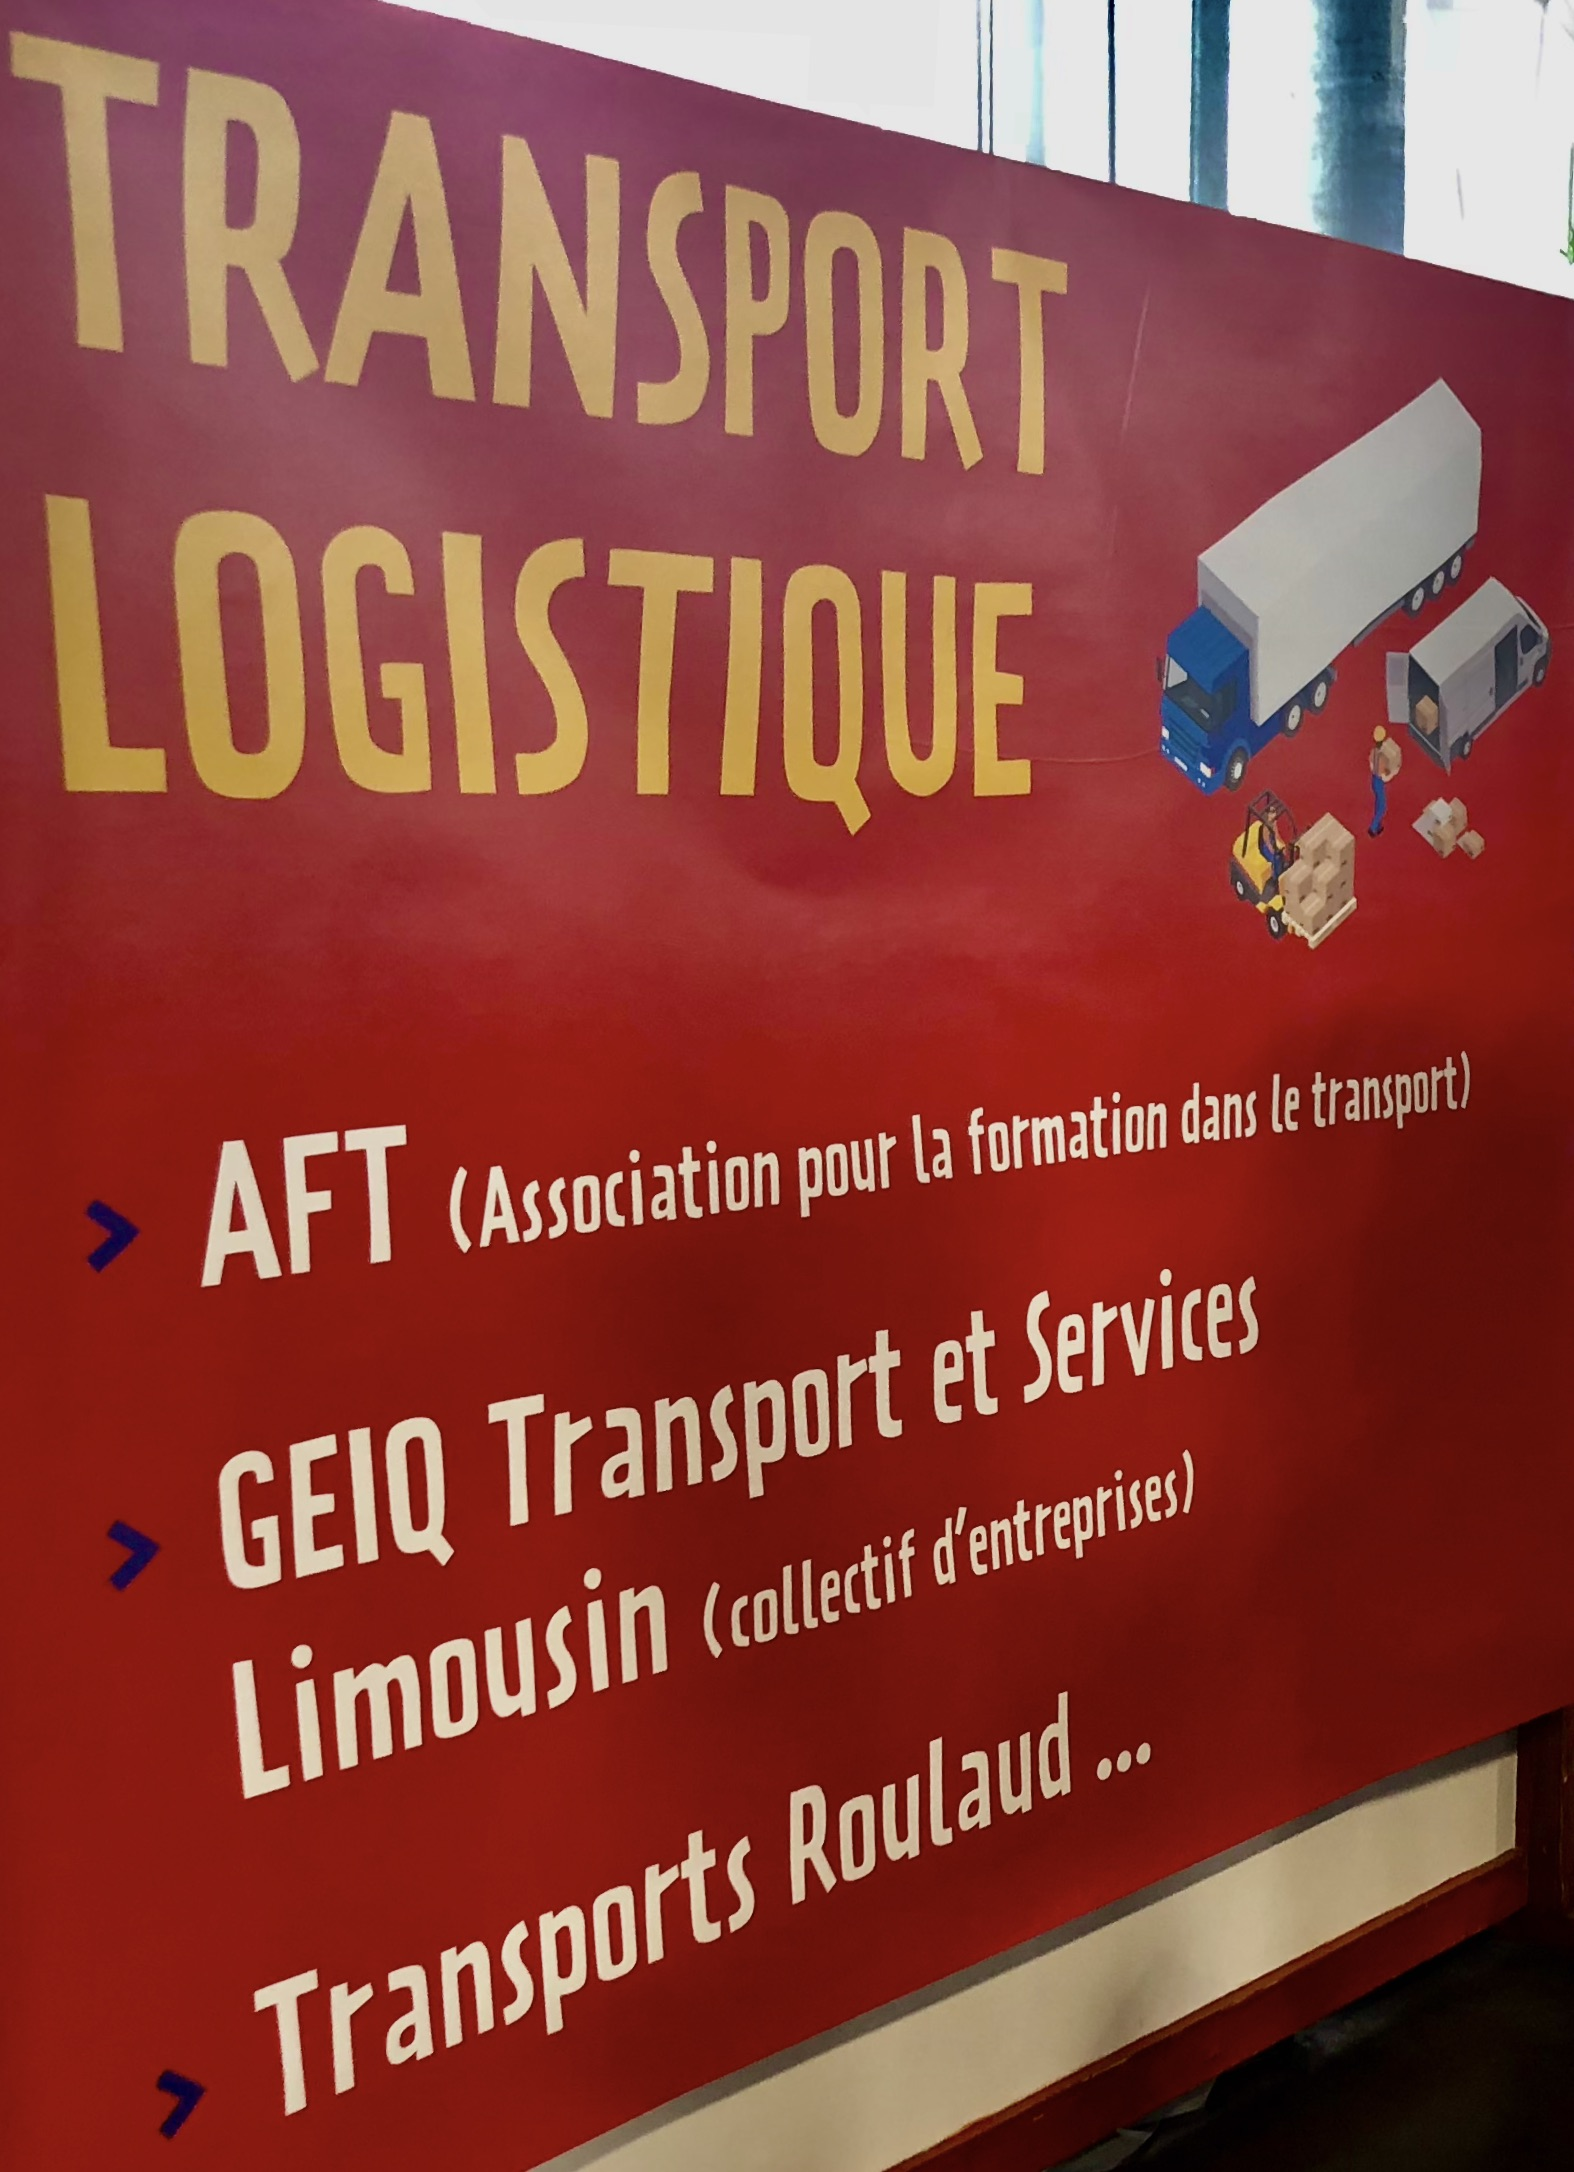 professionnel transport logistique